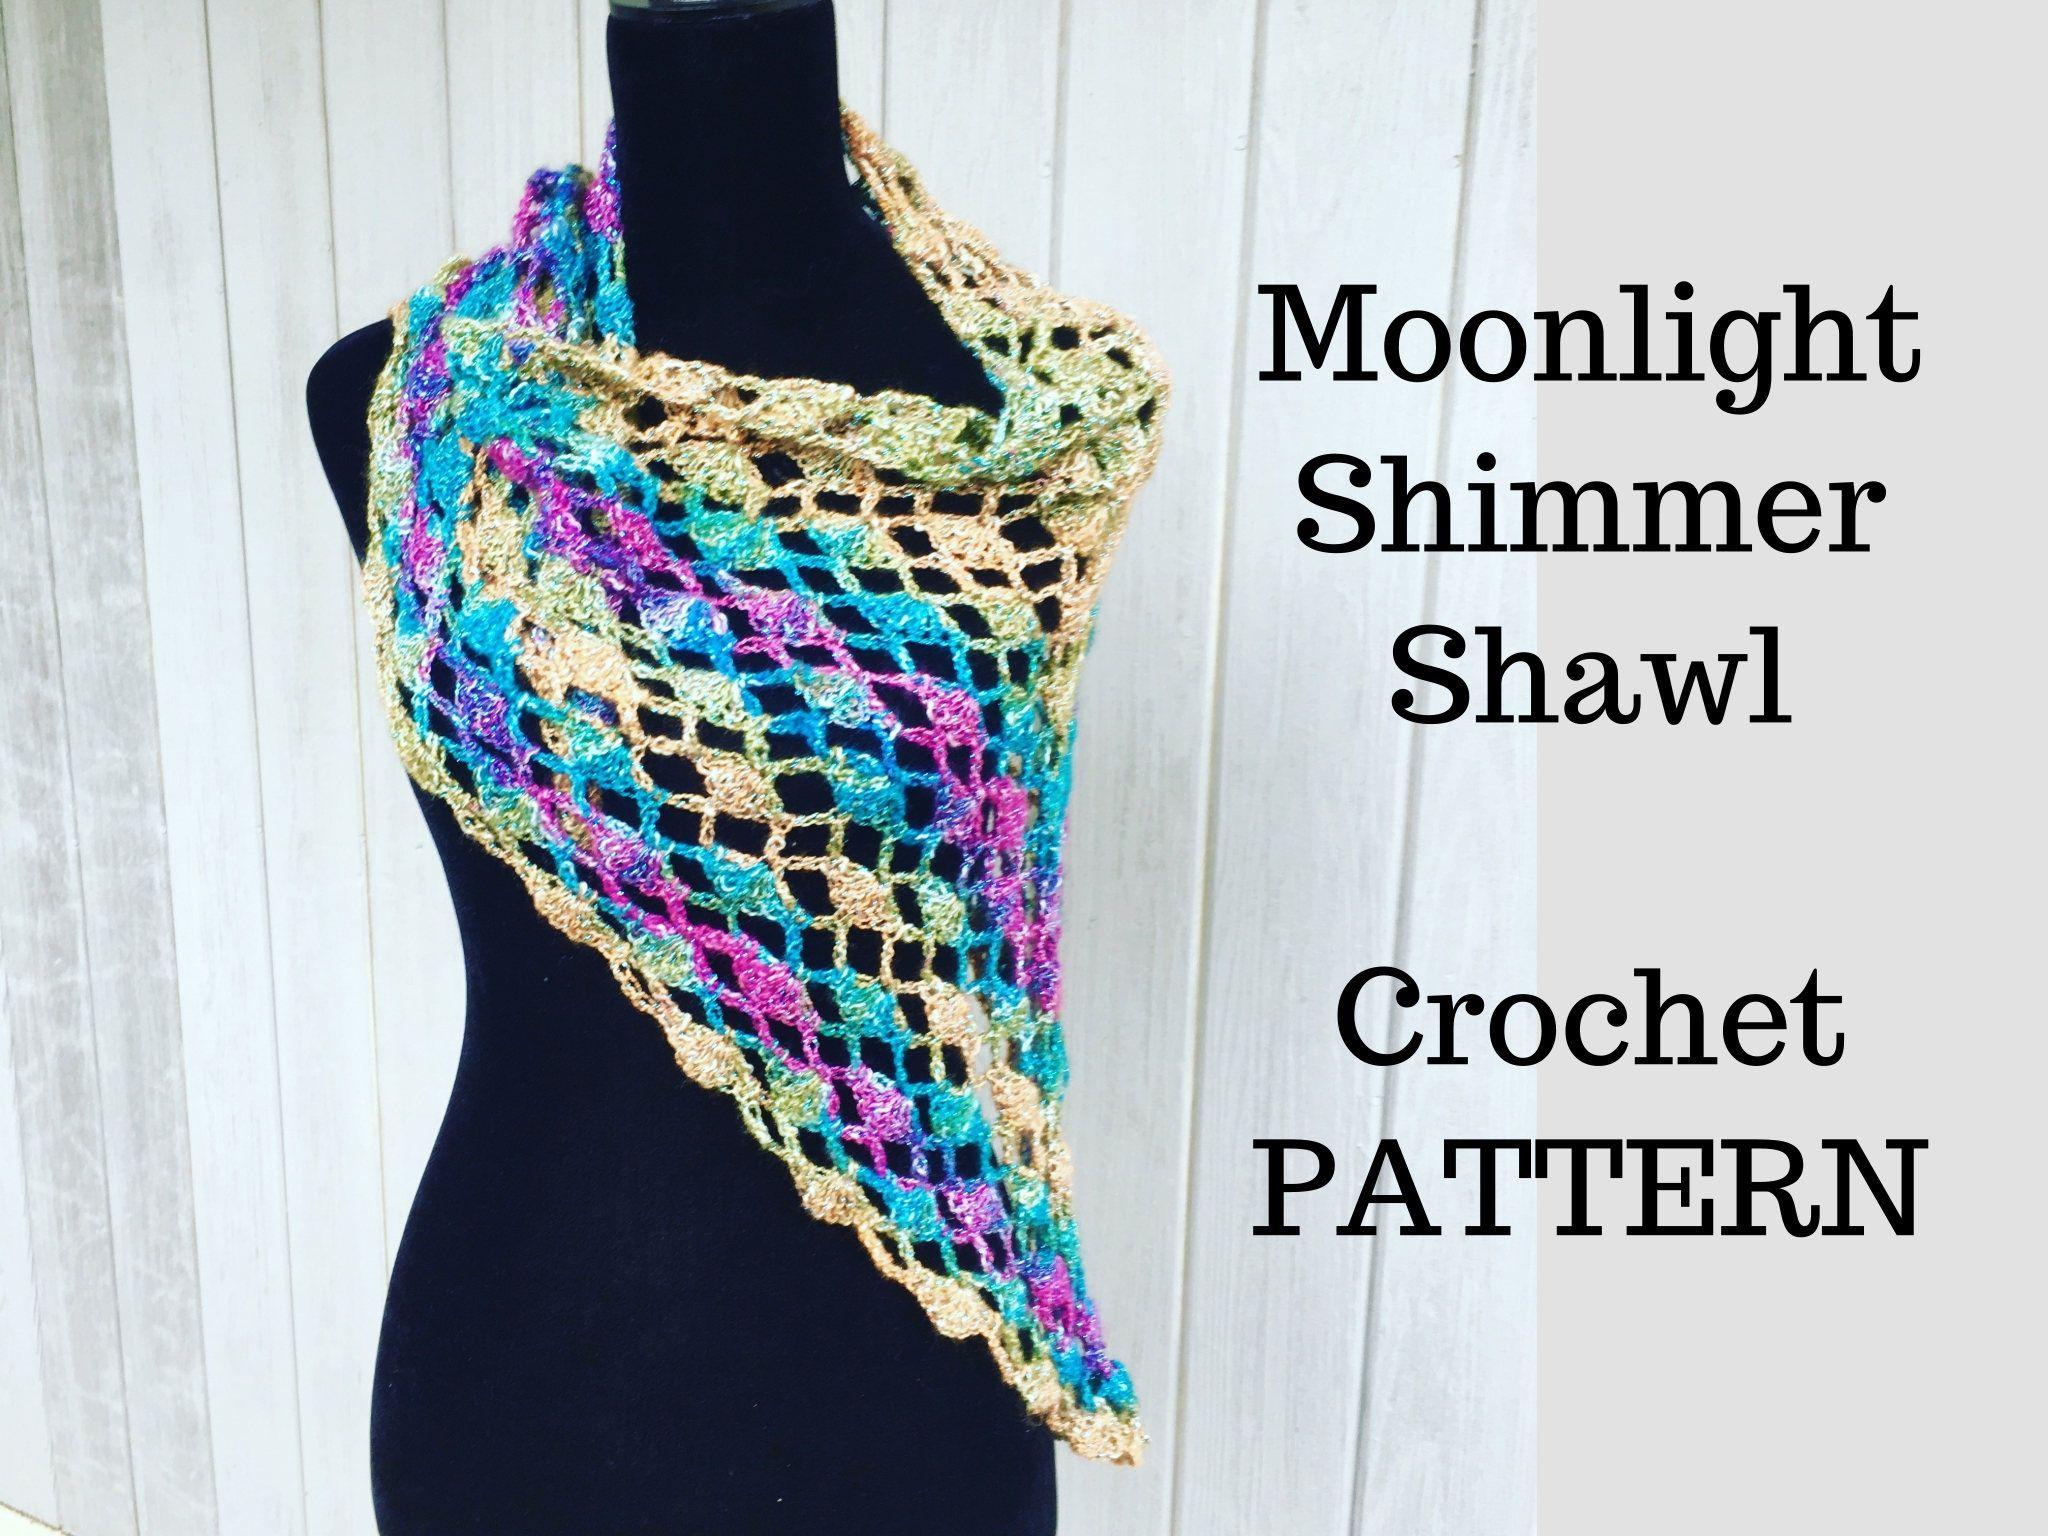 PATTERN - Crochet Lace Shawl - Moonlight Shimmer Shawl - Easy Lace Crochet by LightandJoyDesigns on Etsy